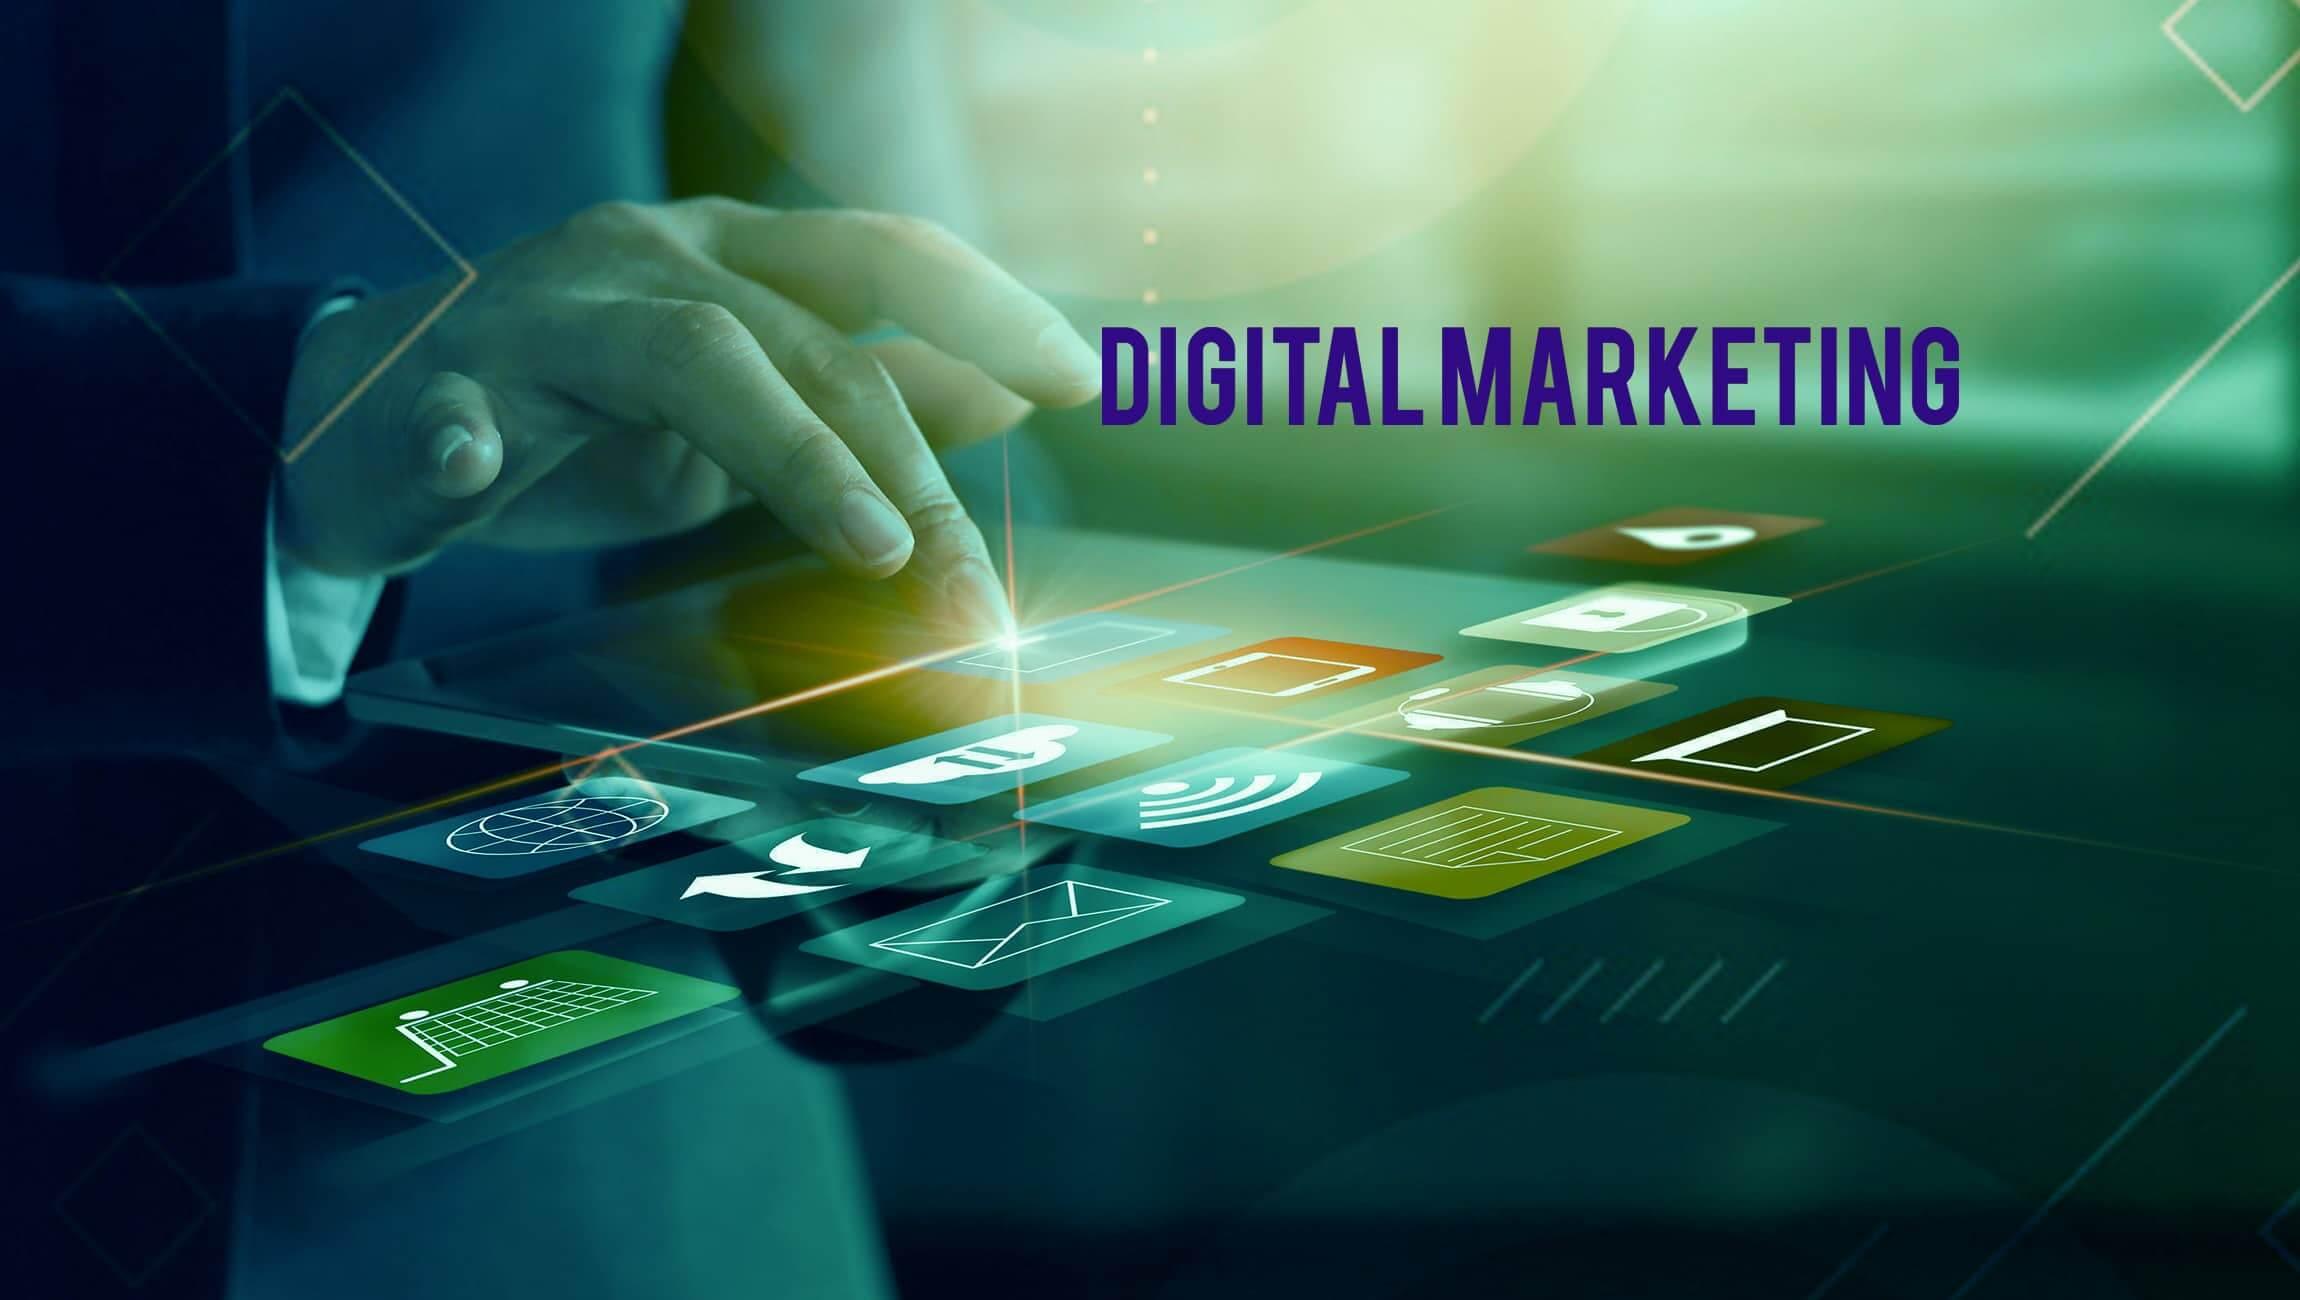 Effective digital marketing strategy